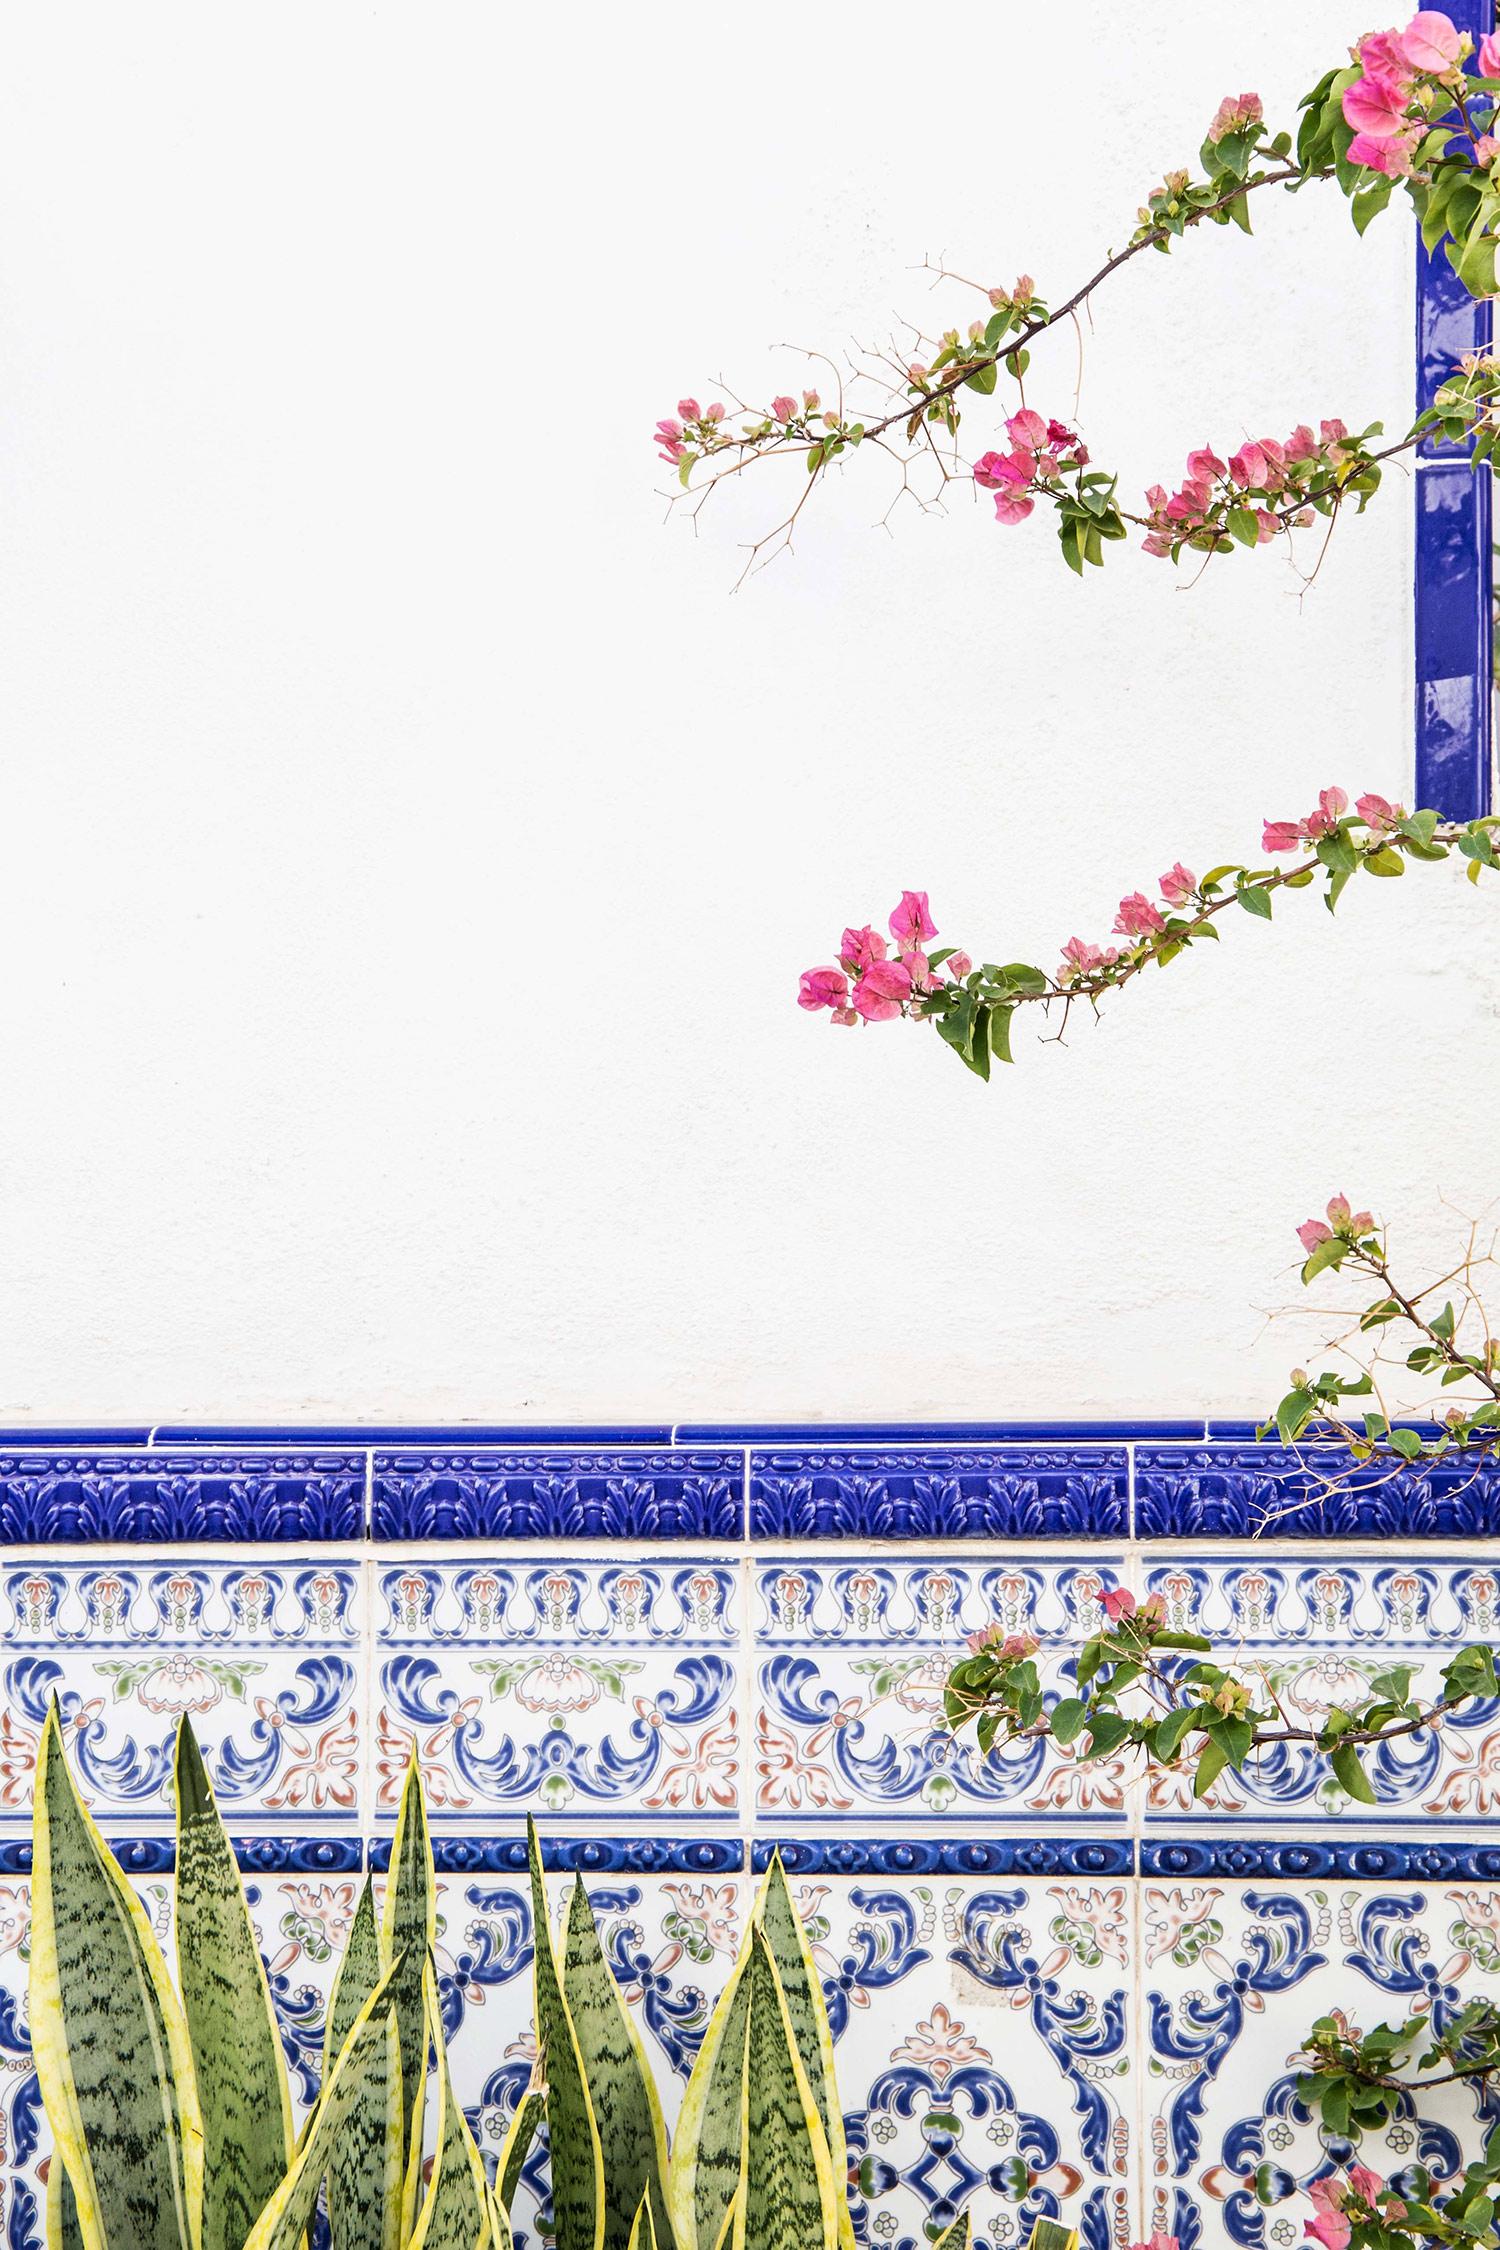 Casa, Mediterraneo, Made in Italy, Stile, Mare